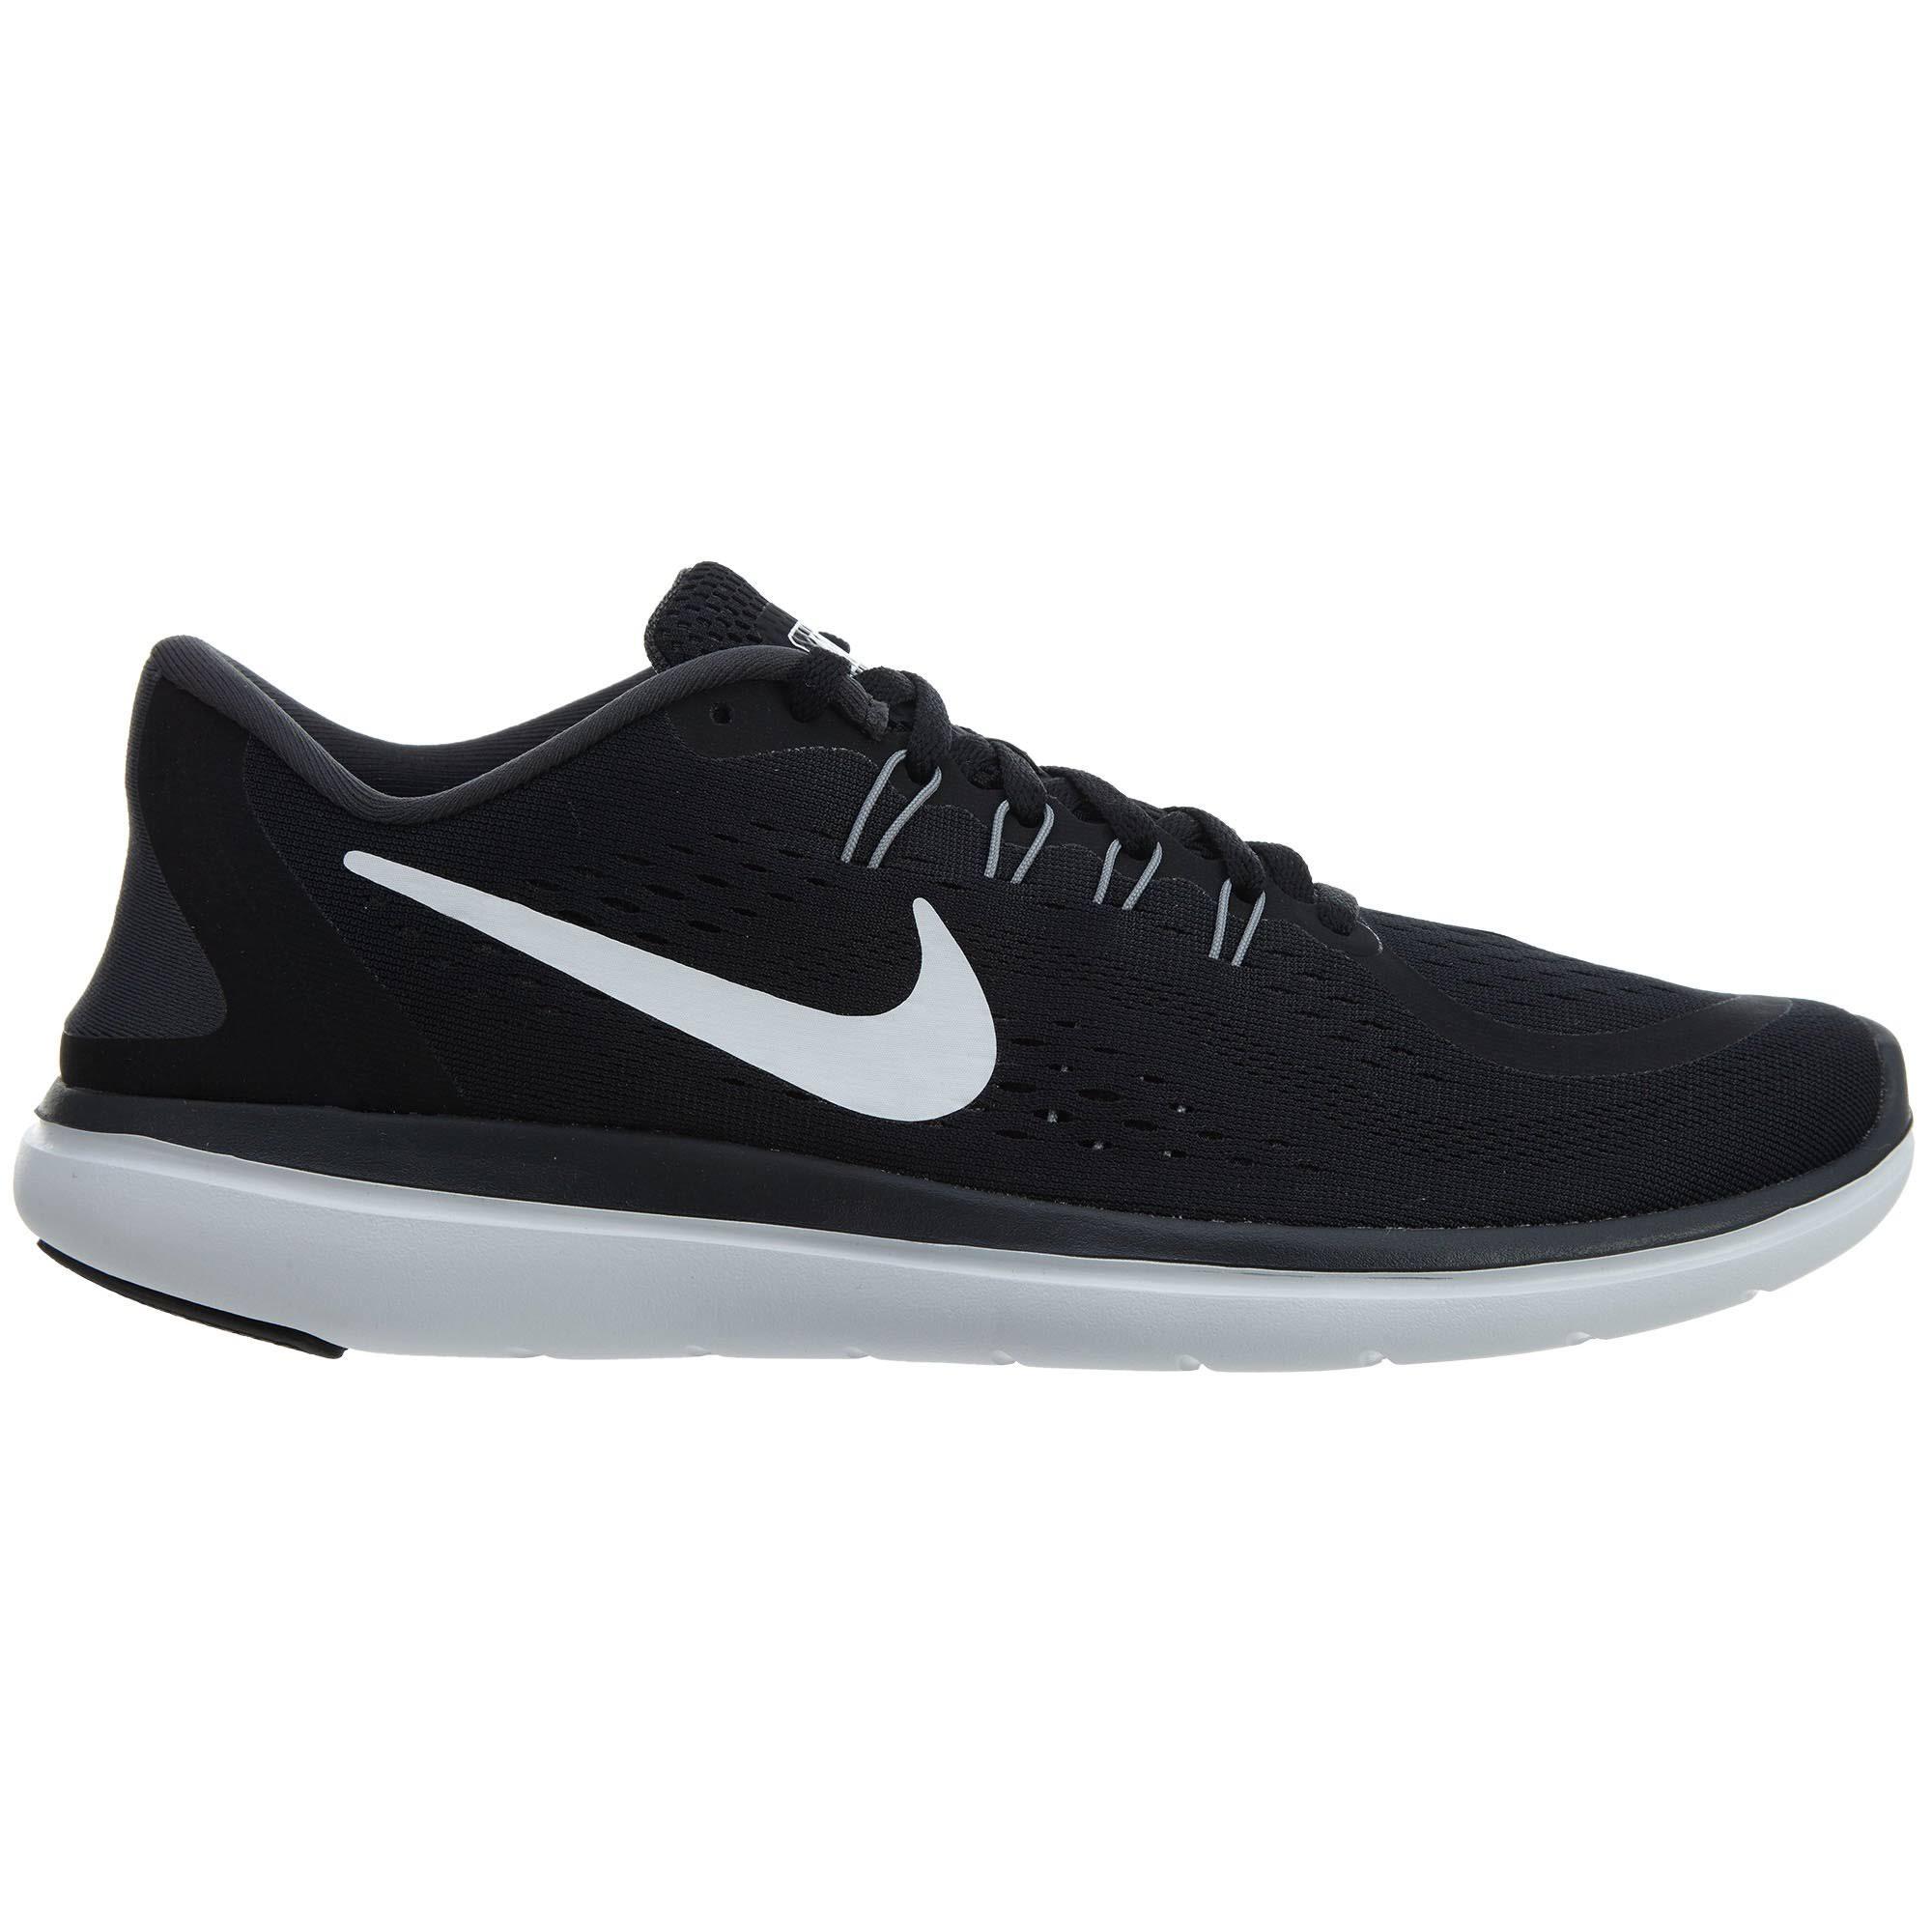 Tamaño Zapatillas Rn Nike 2017 Hombre Para 12 De Flex Running 898457001 Rzwqw1t